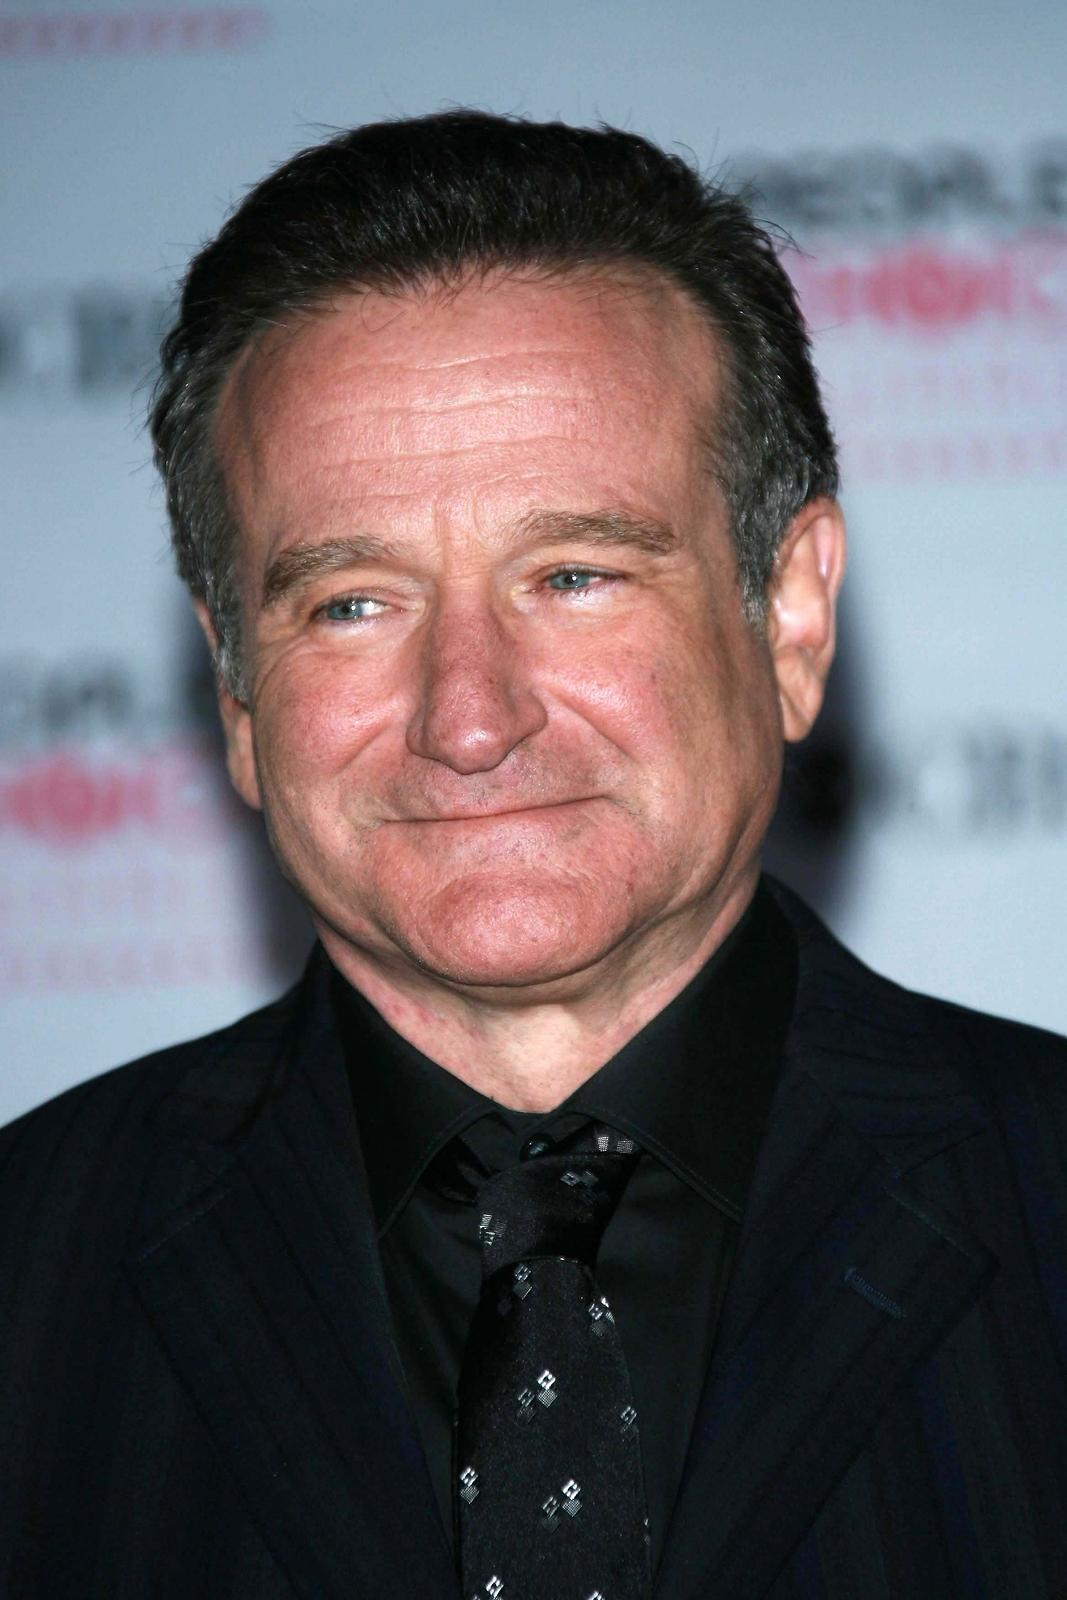 Robin Williams, depression, suicide, legacy of Robin Williams, life lessons from Robin Williams